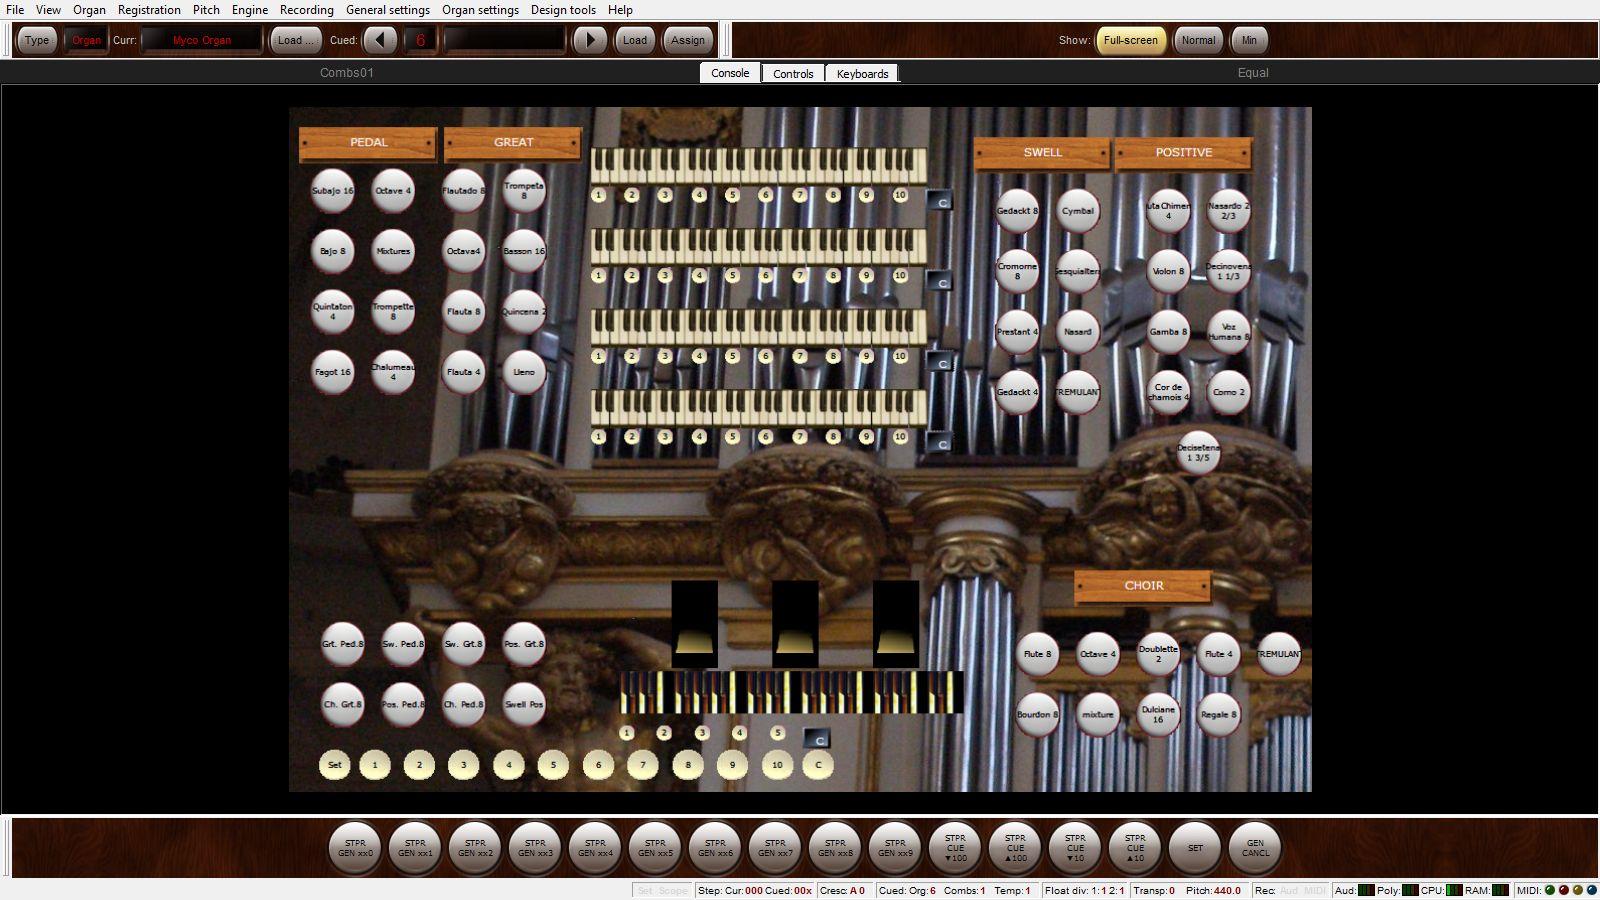 final renditionhttp://organ.monespace.net/ORGANWORKS/software/soft_img/myco-final-rendition.jpg